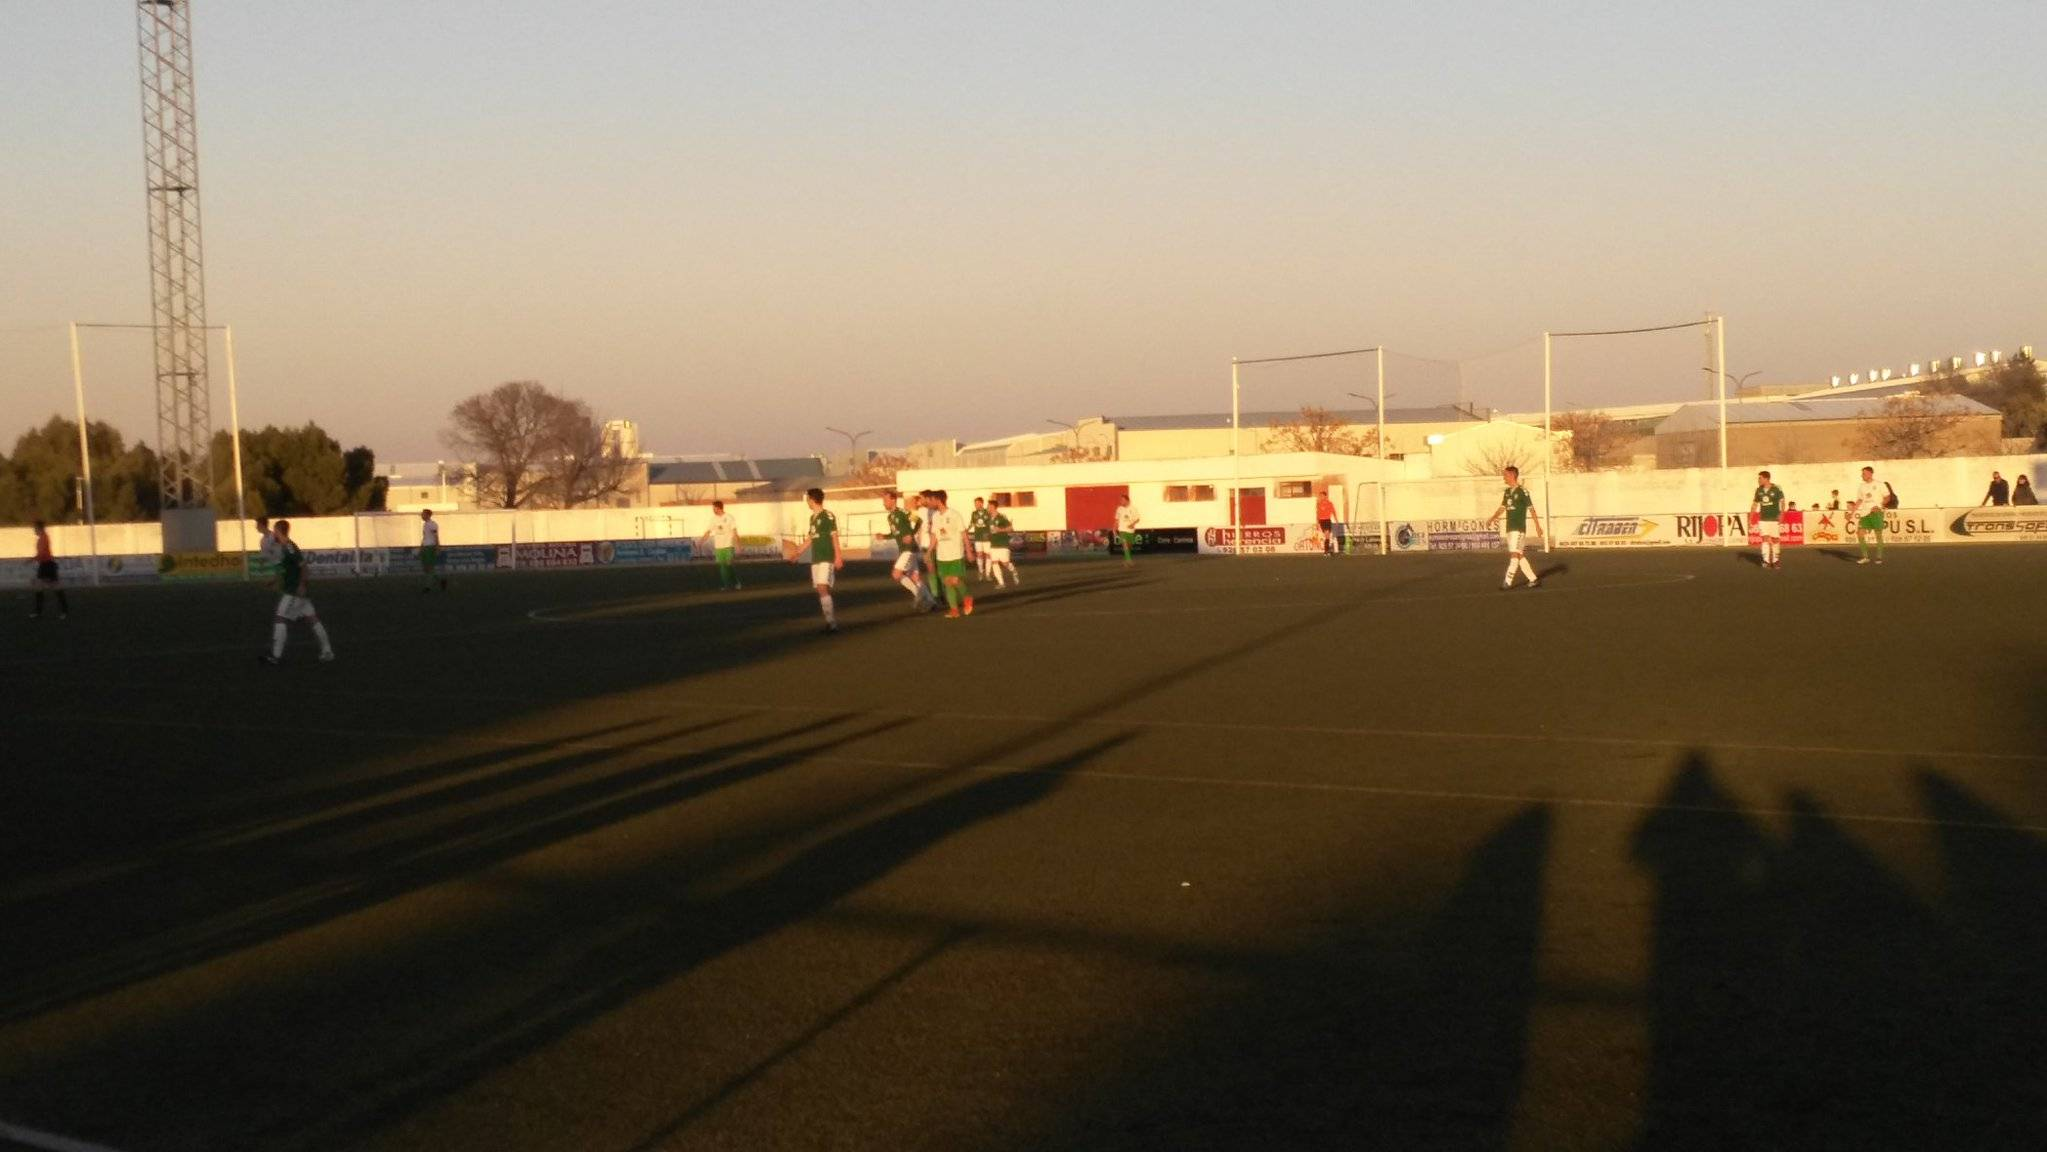 futbol herencia vs calzada 25 febrero 2018 - CDB Herencia rompe su mala racha con un 4-1 frente al Calzada CF